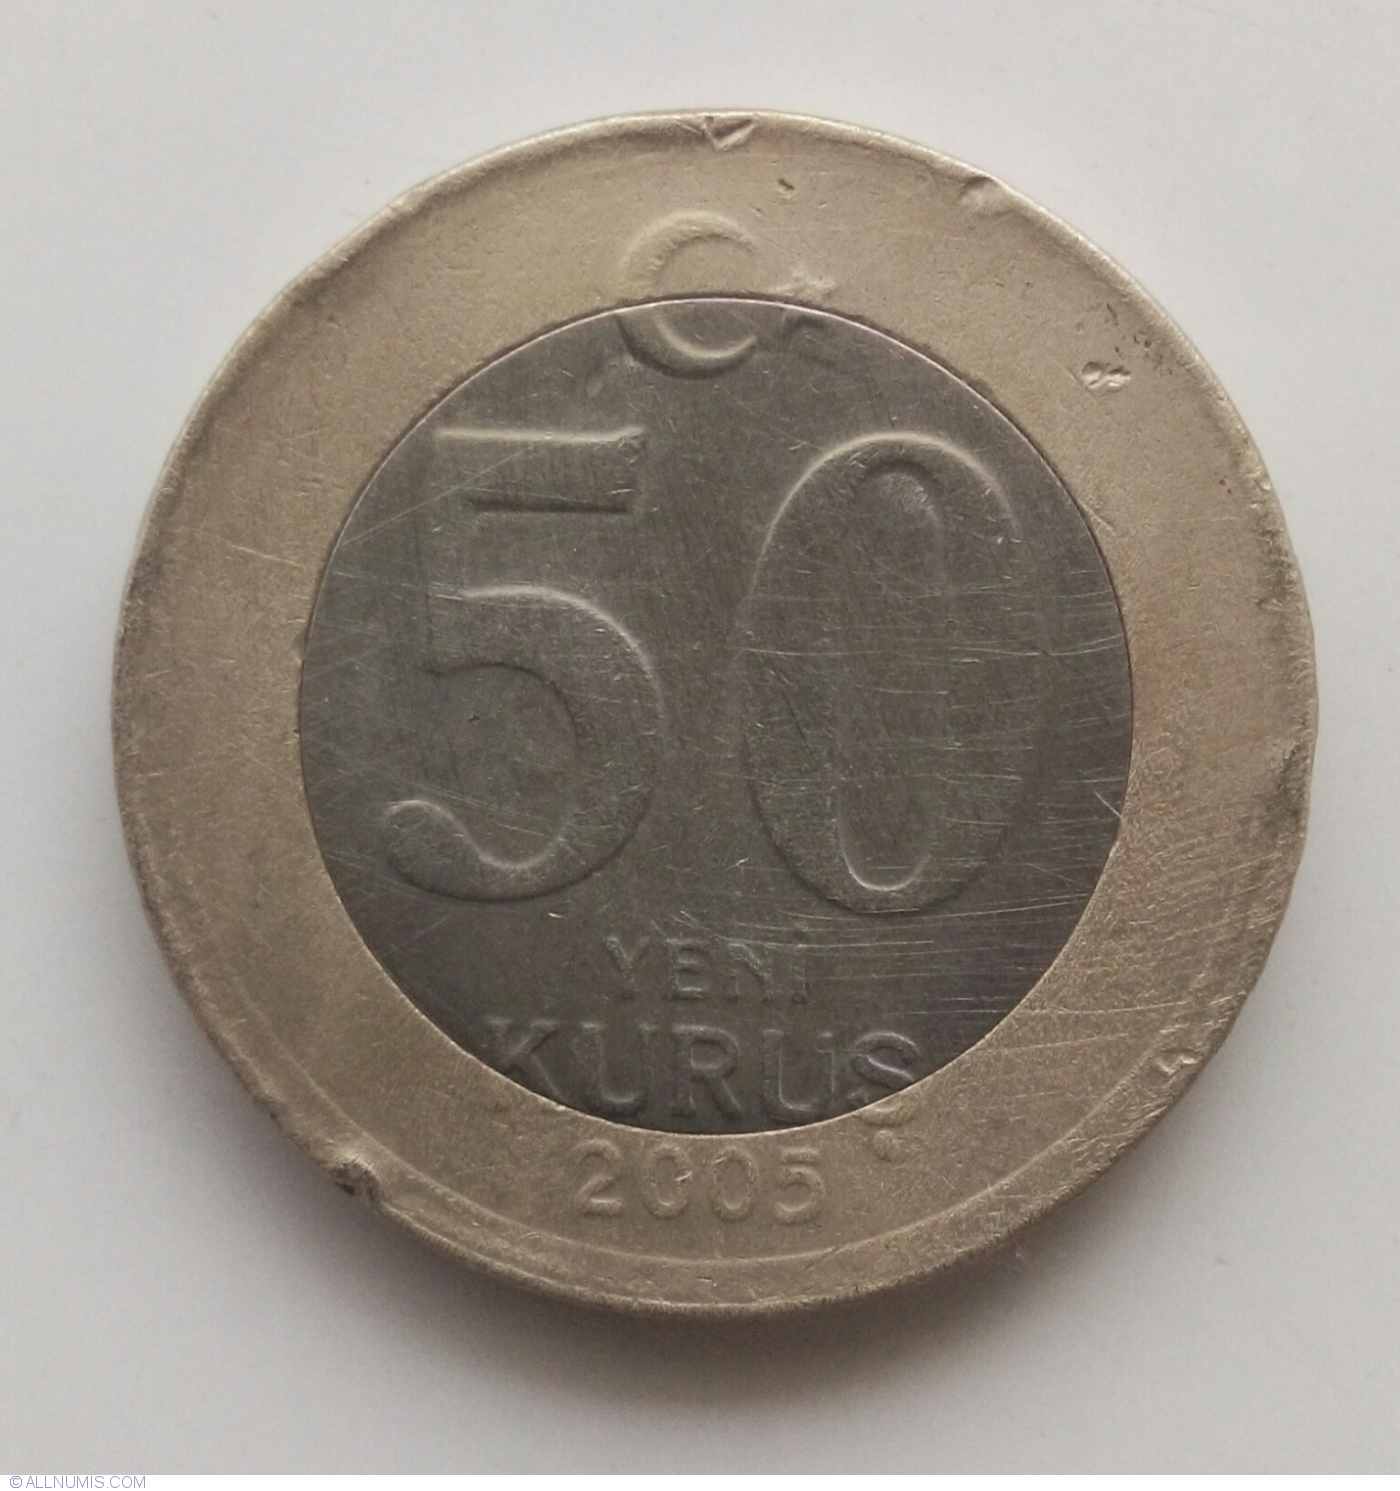 Viberate token 50 30 - Siacoin price 2020